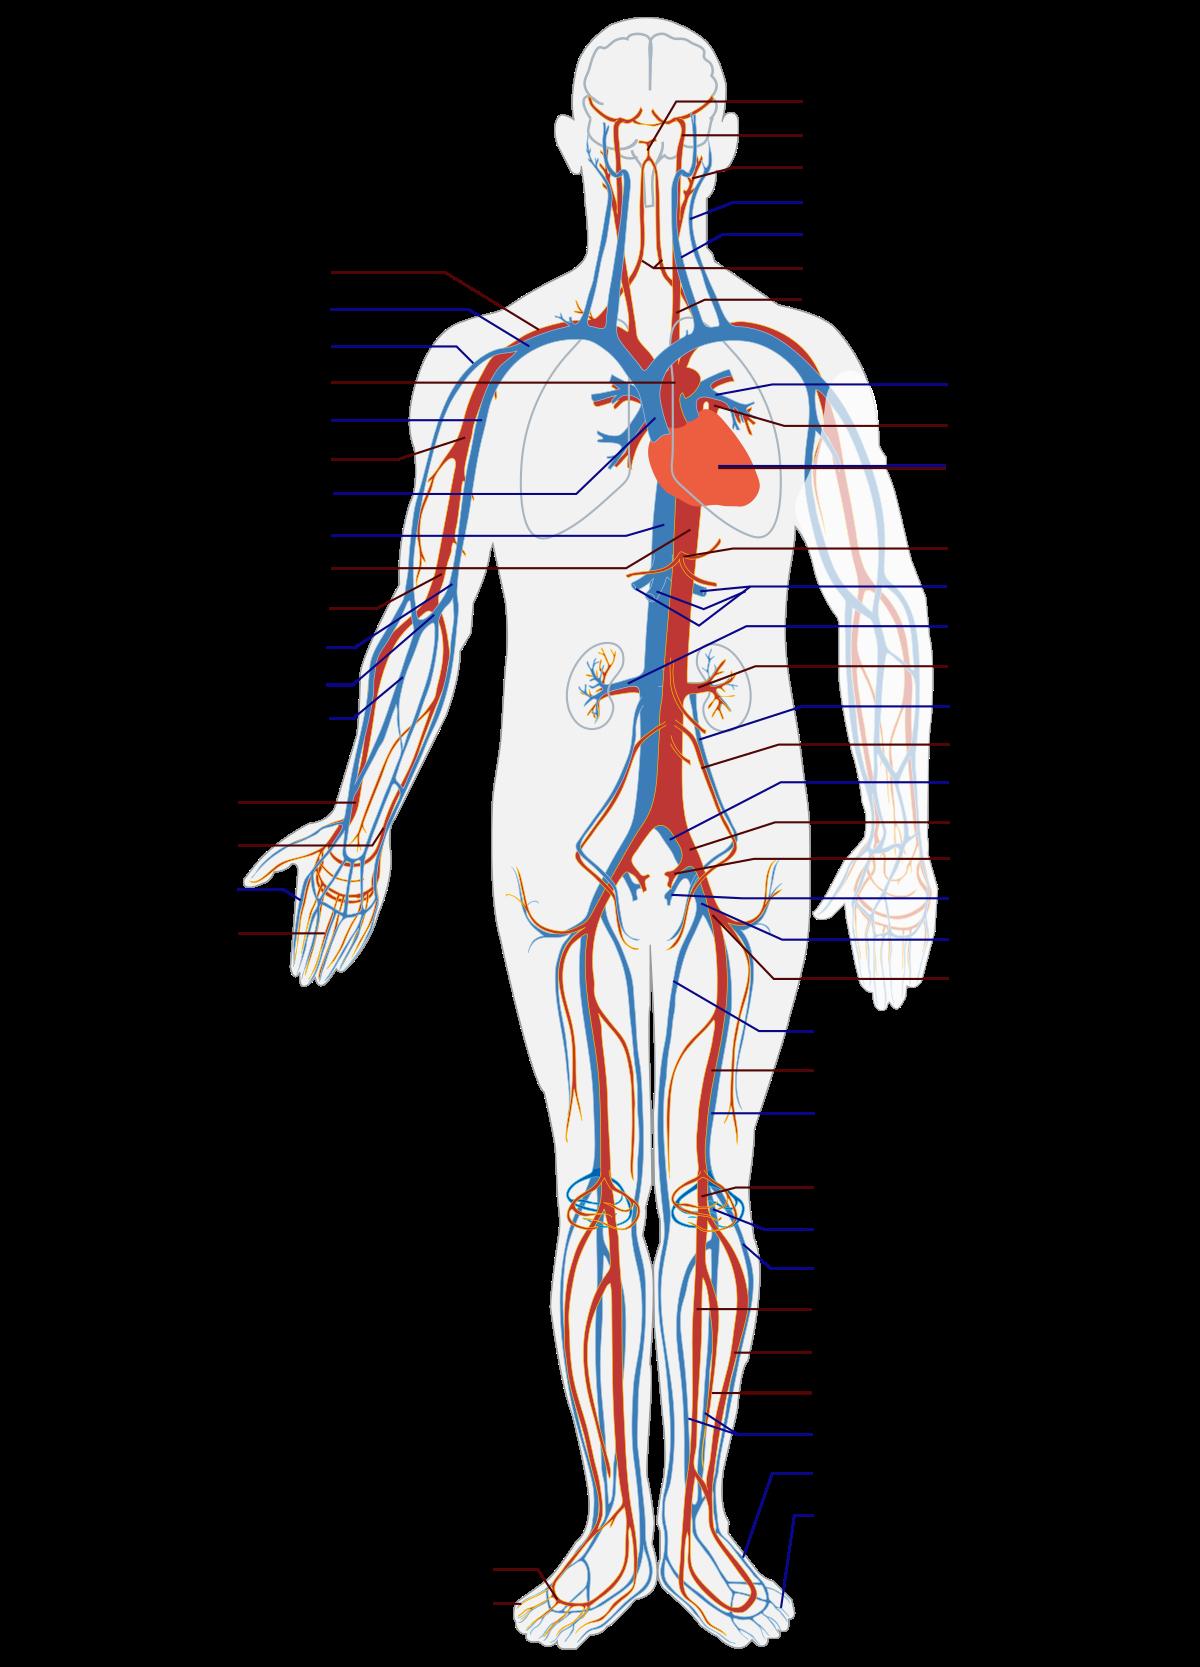 Arteries And Veins Diagram Blood Vessel Wikipedia